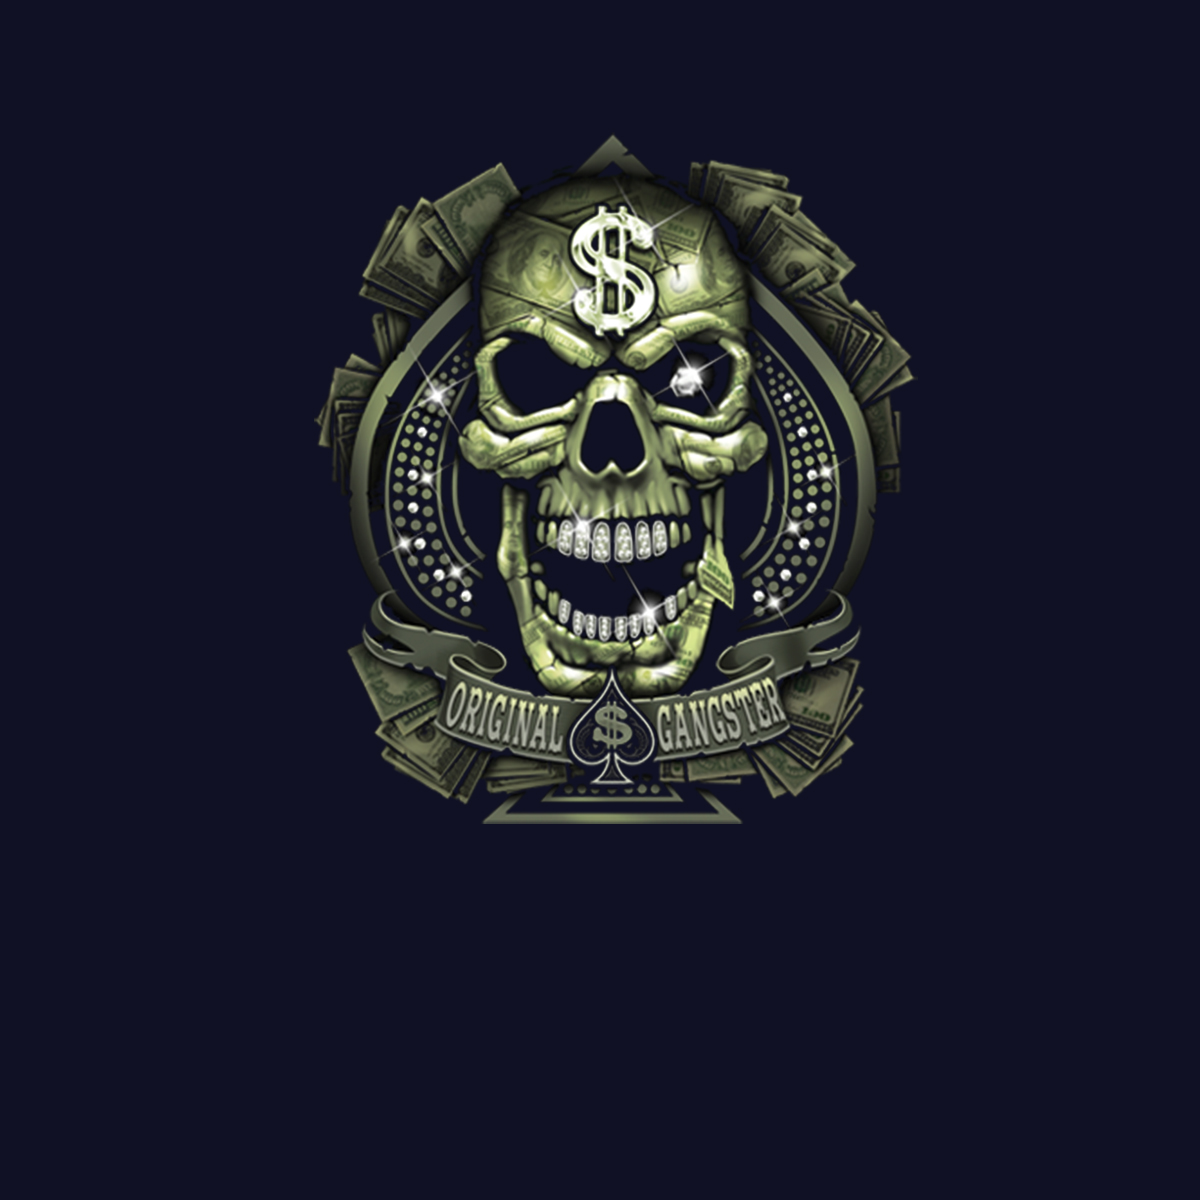 Diamond Skull Gangster Money Men T-shirt XS-5XL New